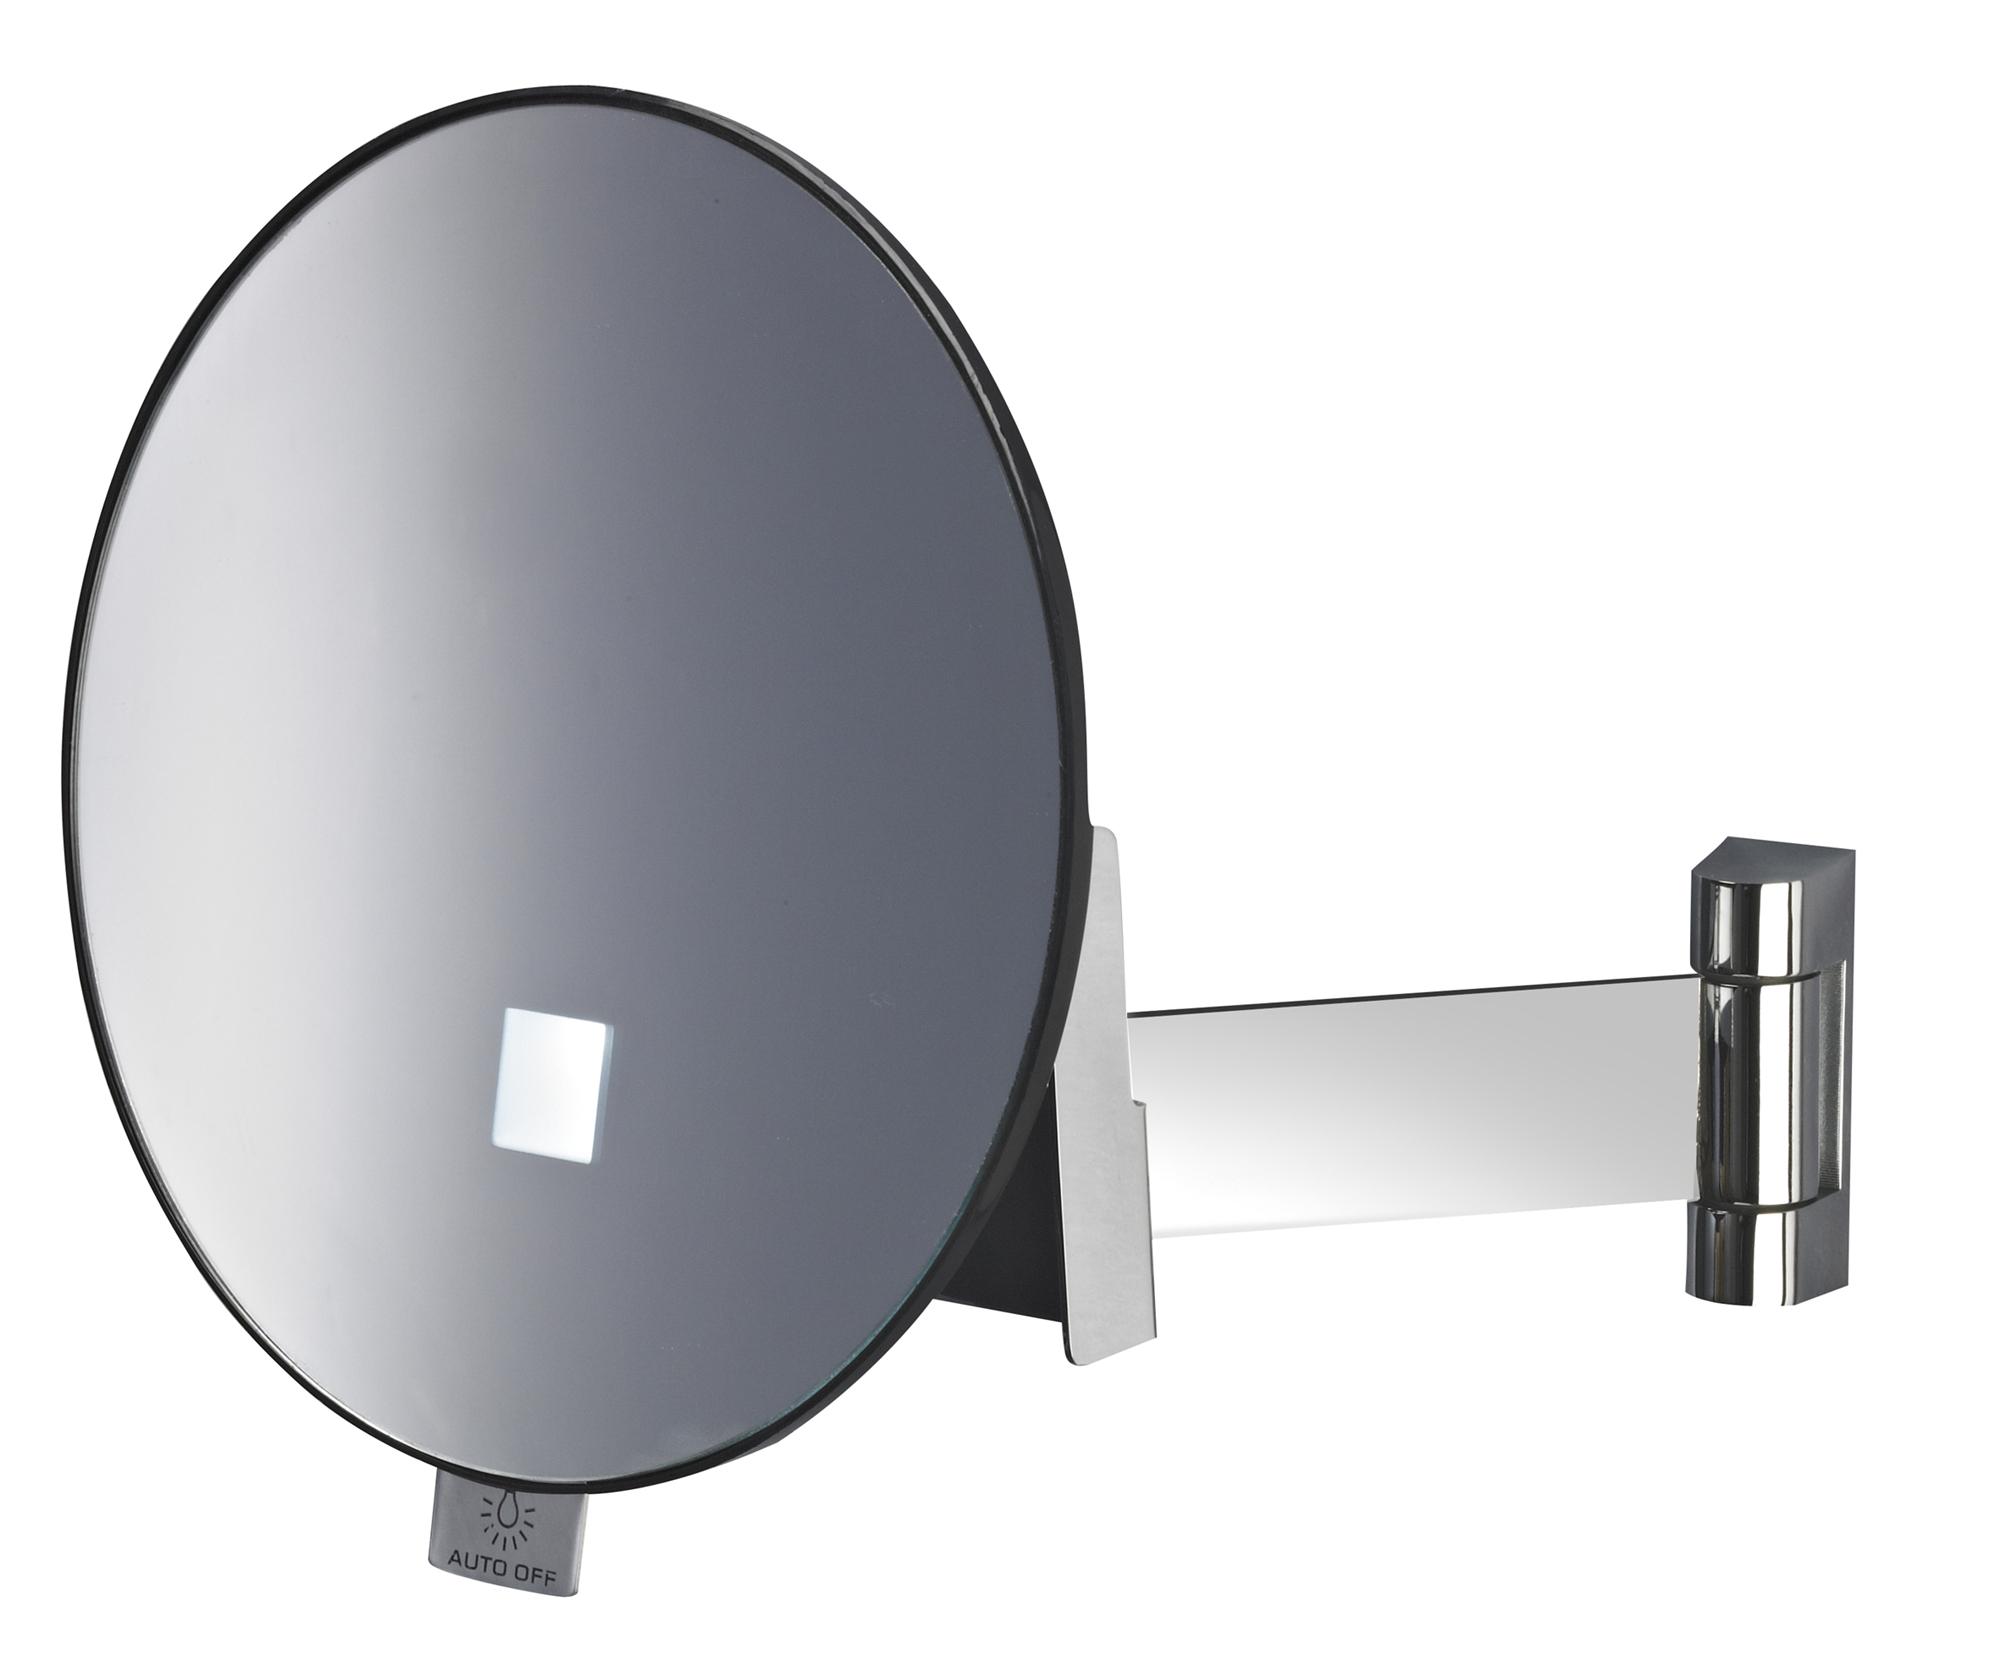 miroir grossissant lumineux eclips rond jvd. Black Bedroom Furniture Sets. Home Design Ideas